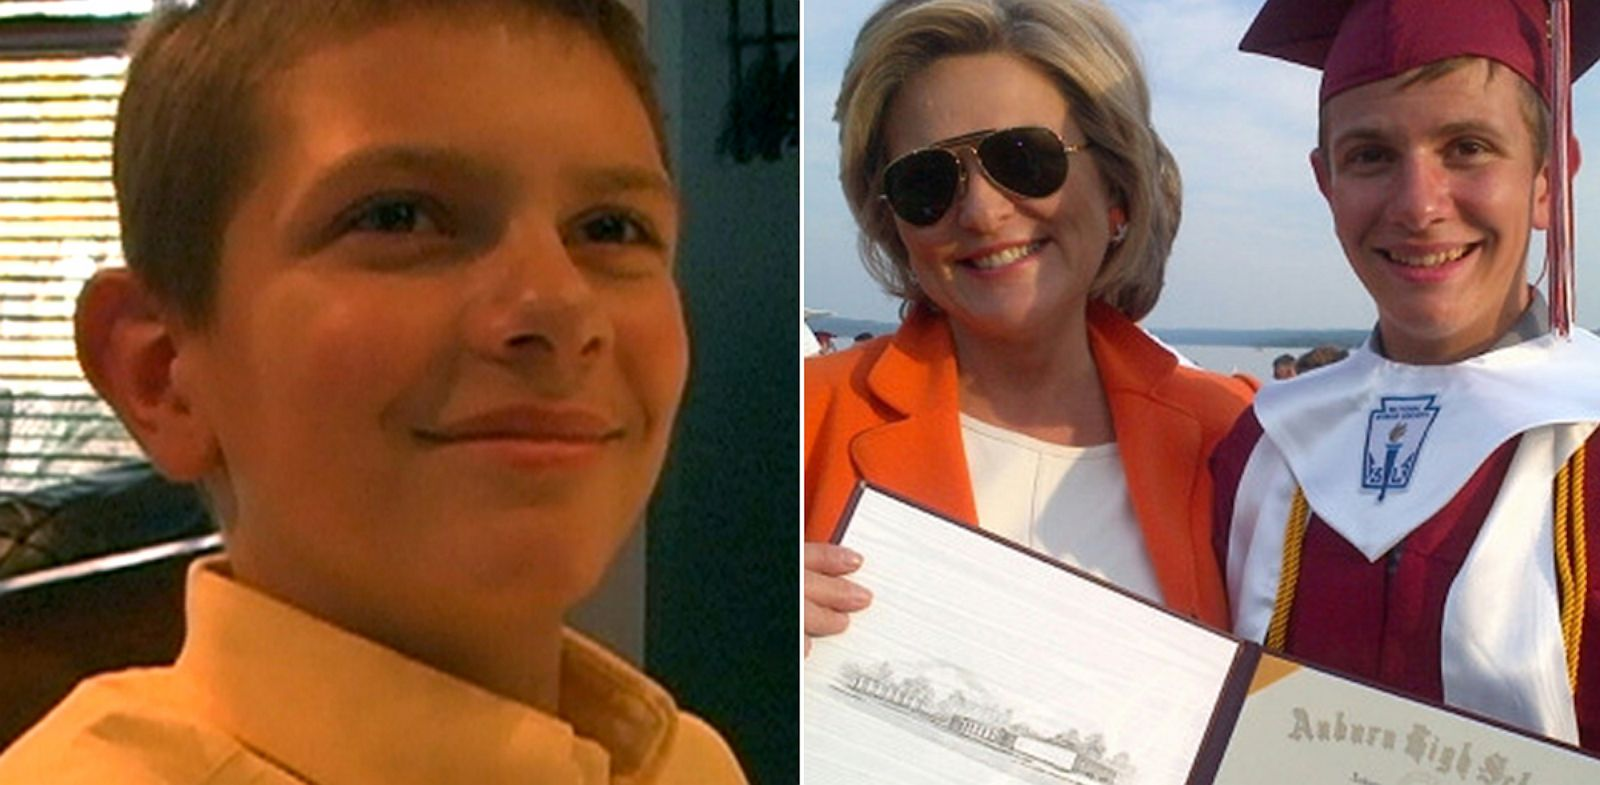 PHOTO: Boy Overcomes Rare Cancer